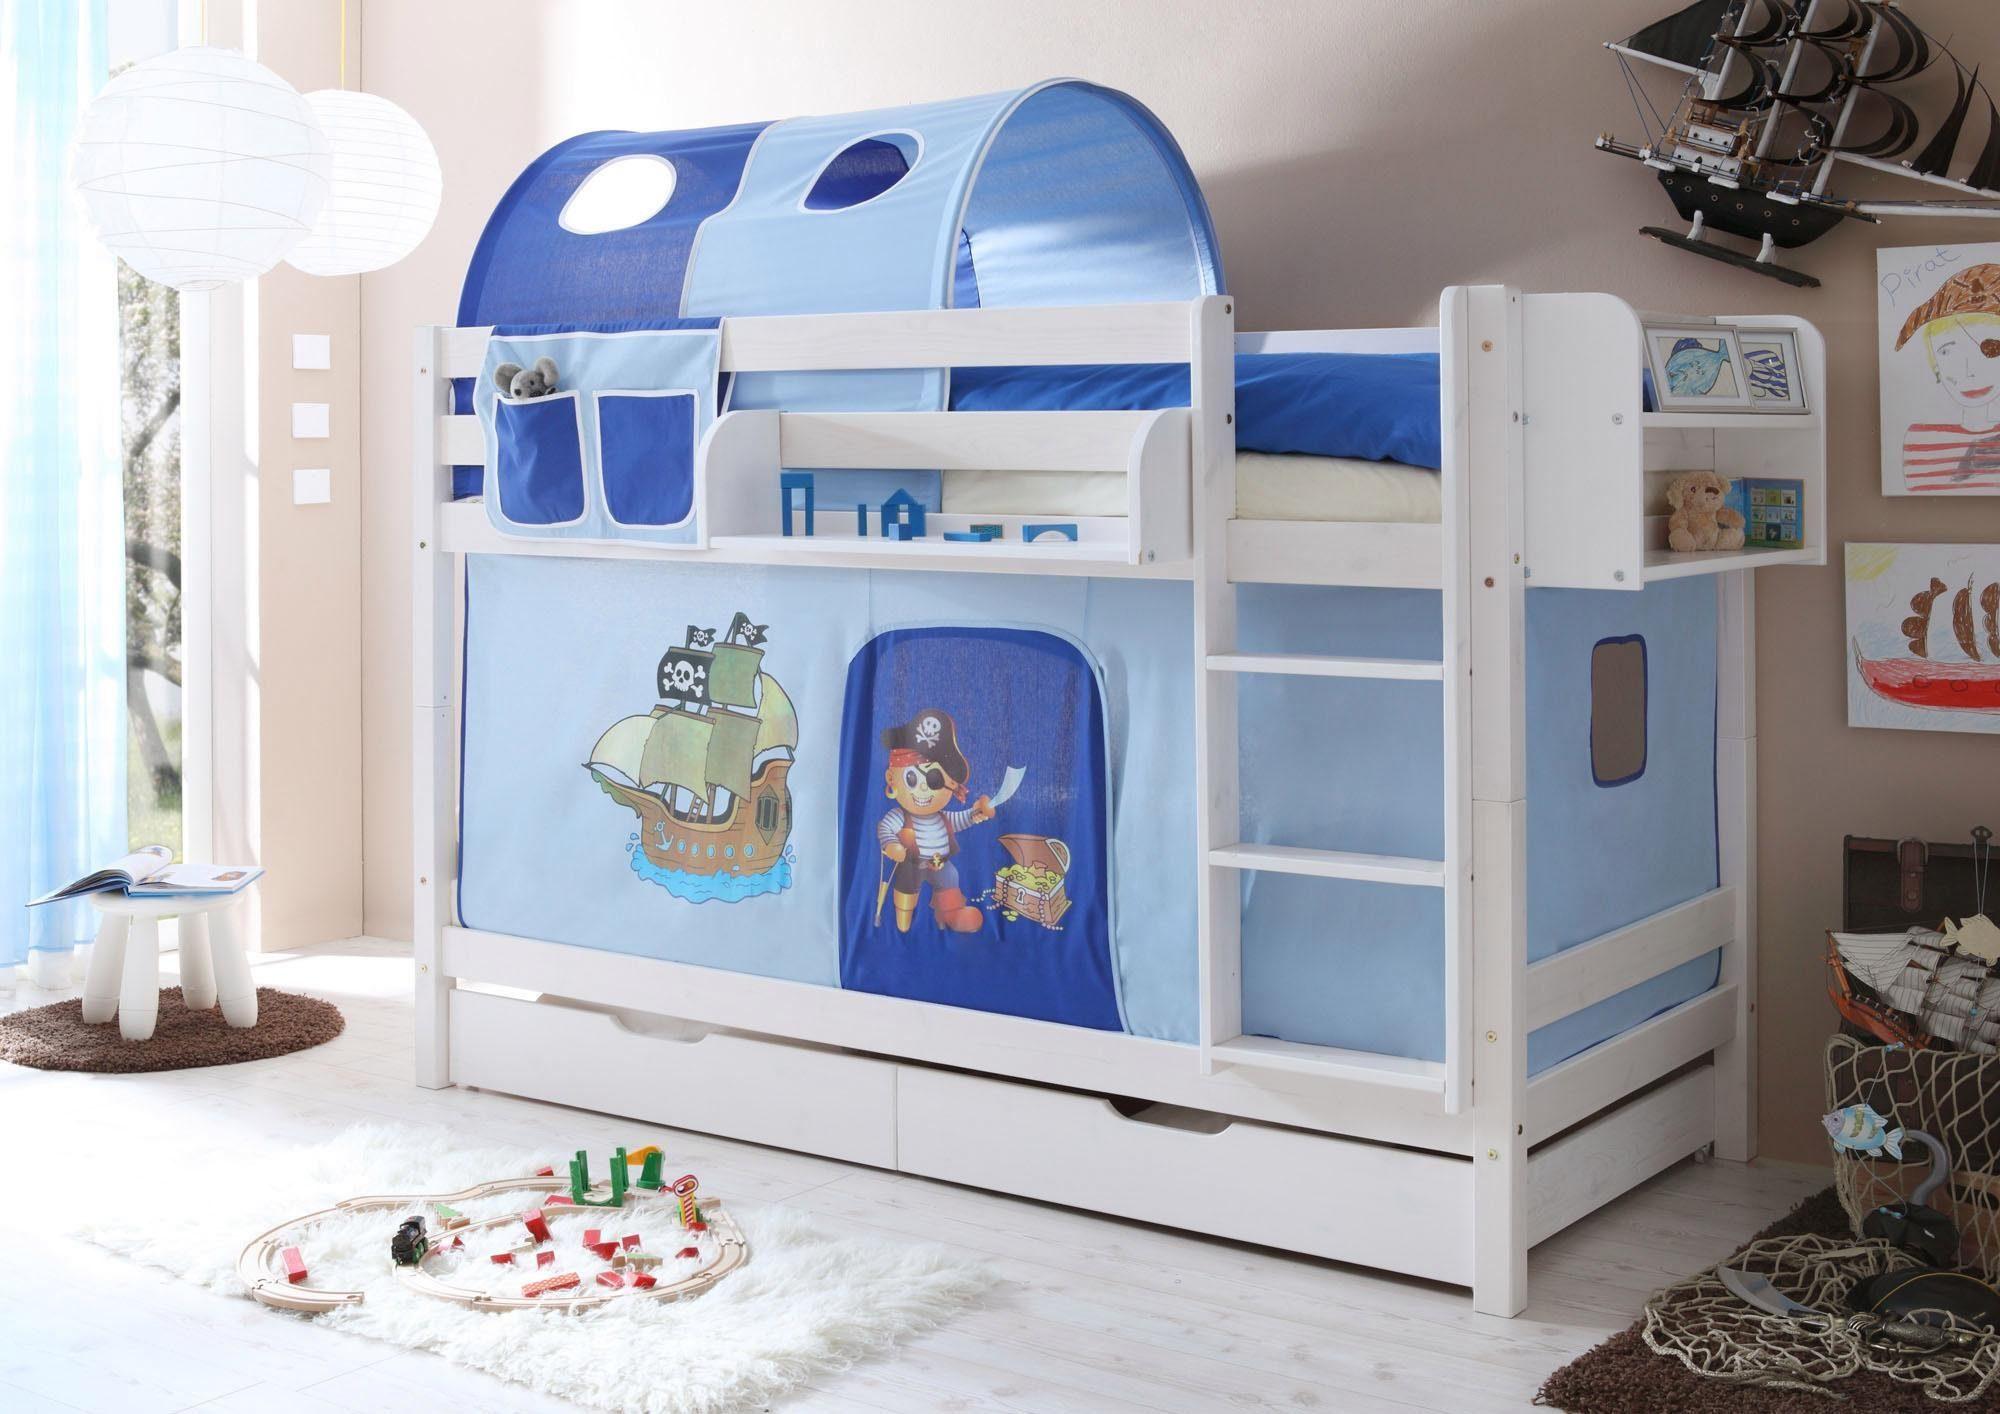 Etagenbett Lukas : Kindermoebel shop etagenbetten online kaufen möbel